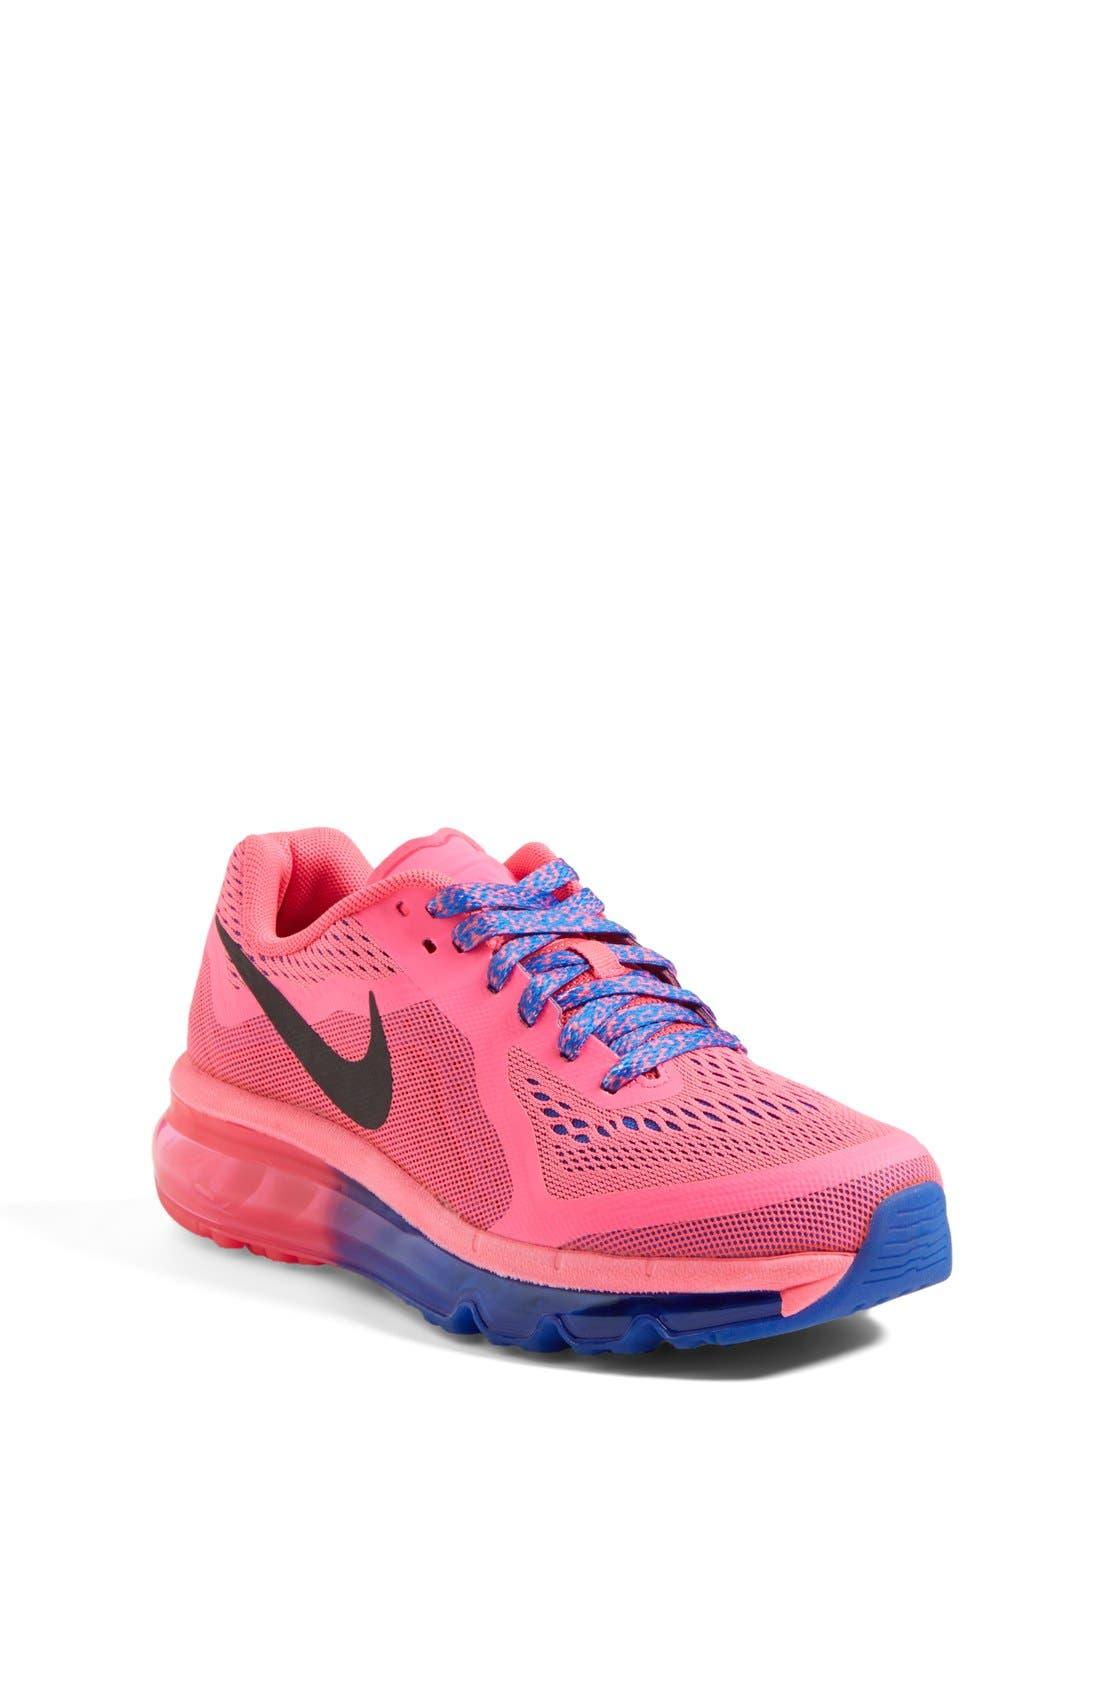 Alternate Image 1 Selected - Nike 'Air Max 2014' Running Shoe (Big Kid) (Online Only)